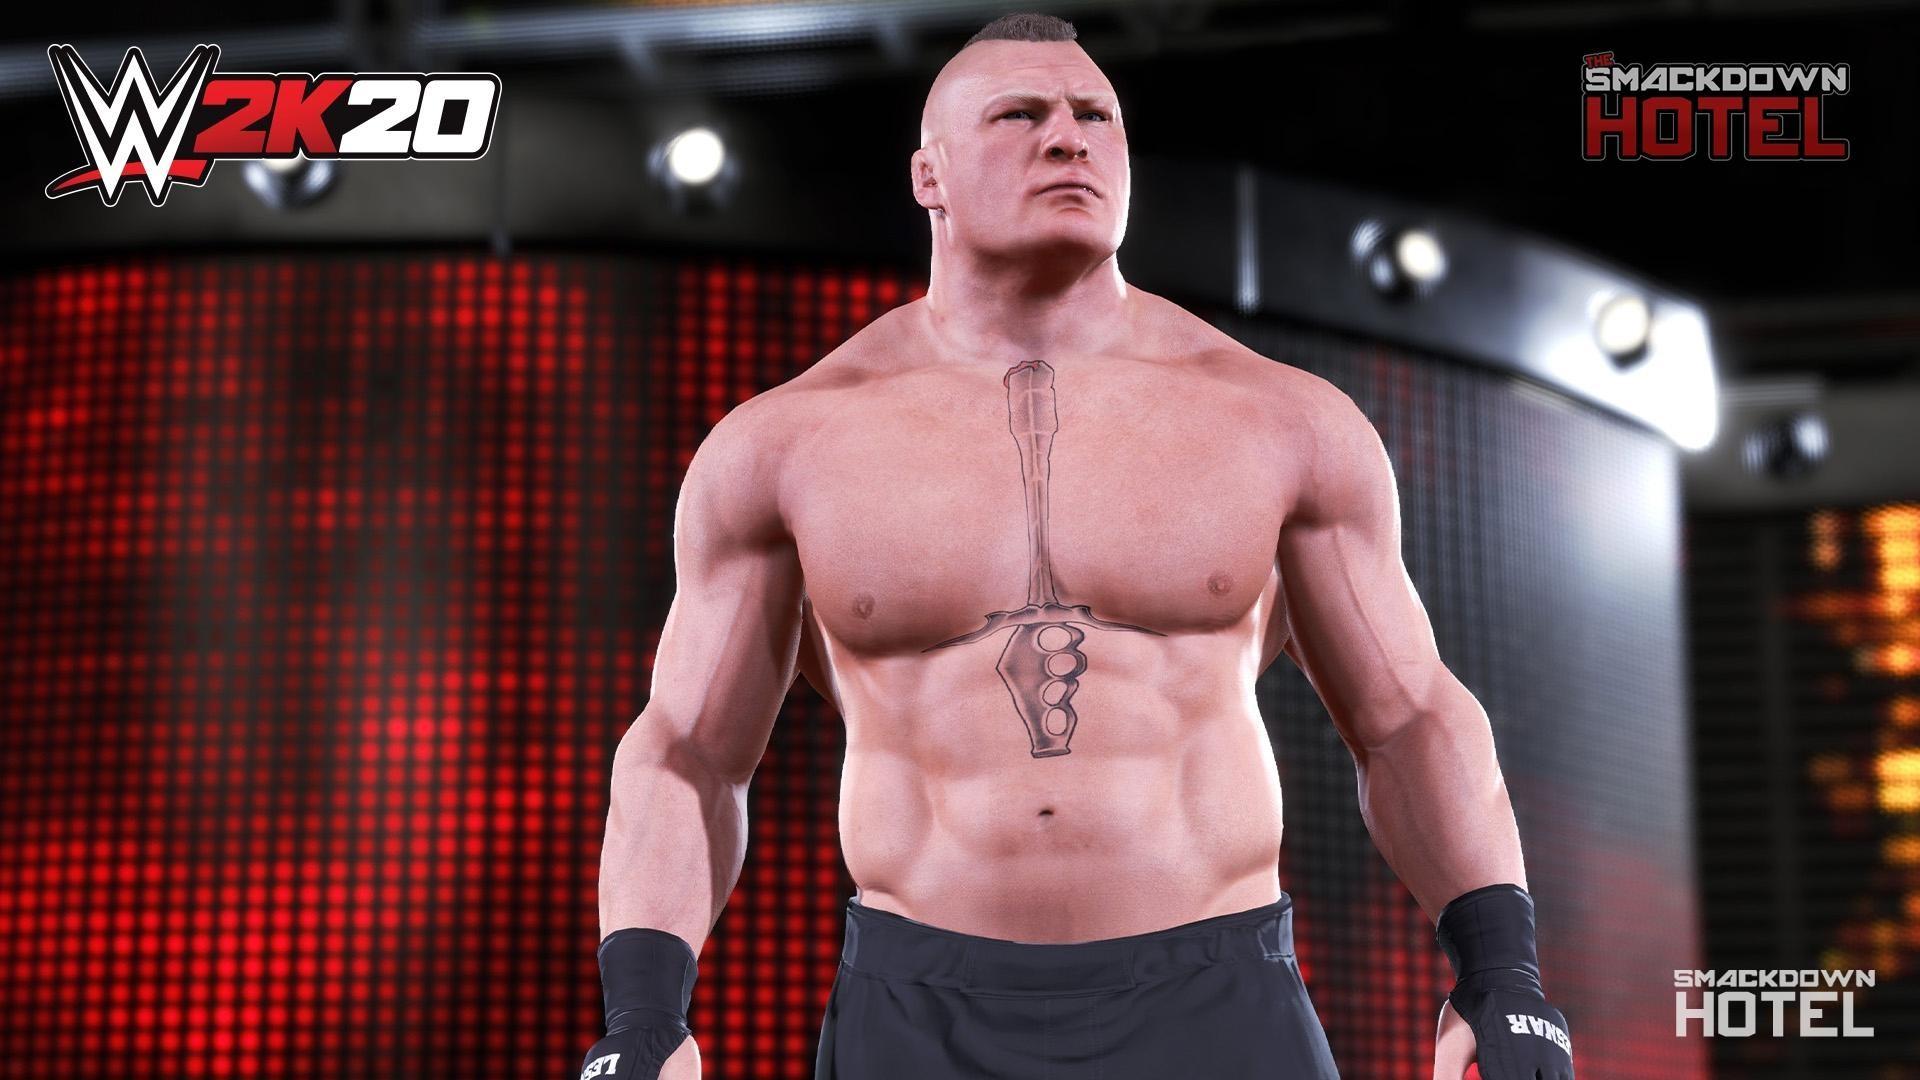 Wwe 2k20 First Official Screenshots Released Featuring Brock